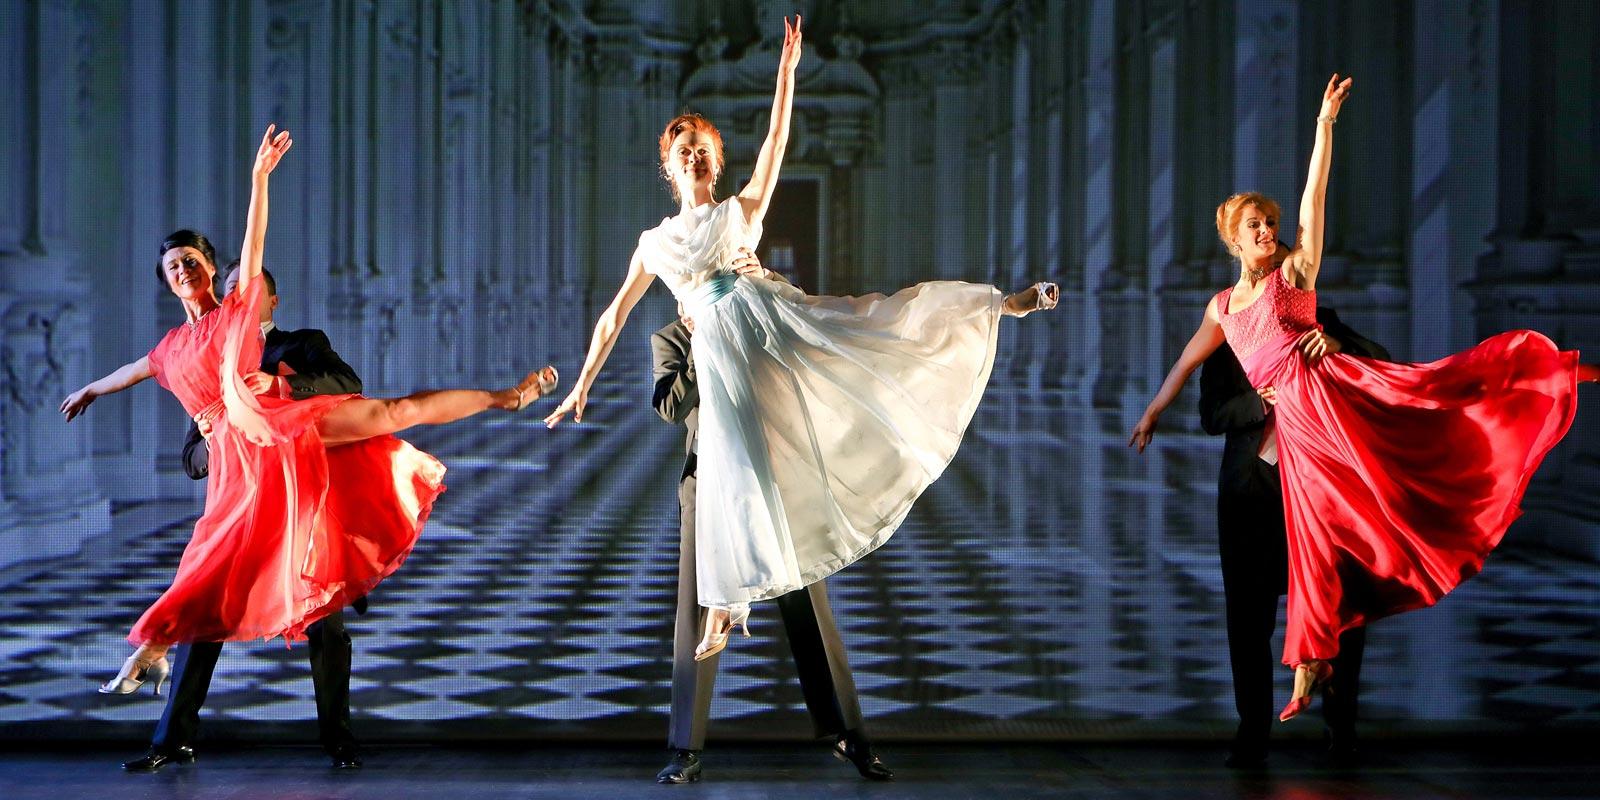 Fotos: Landestheater Detmold / Birgit Hupfeld